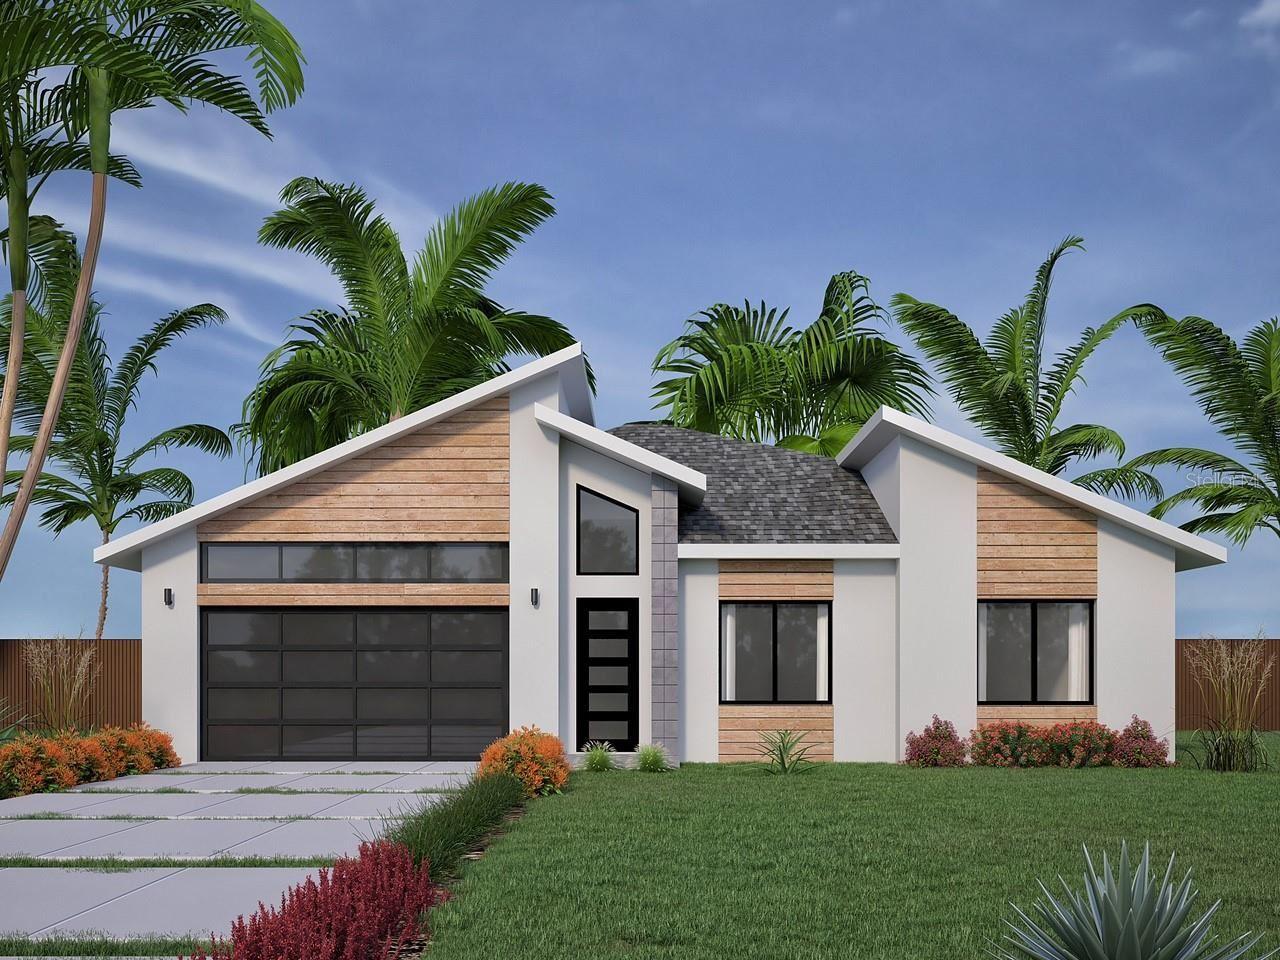 4312 S GRADY AVENUE, Tampa, FL 33611 - #: U8127211